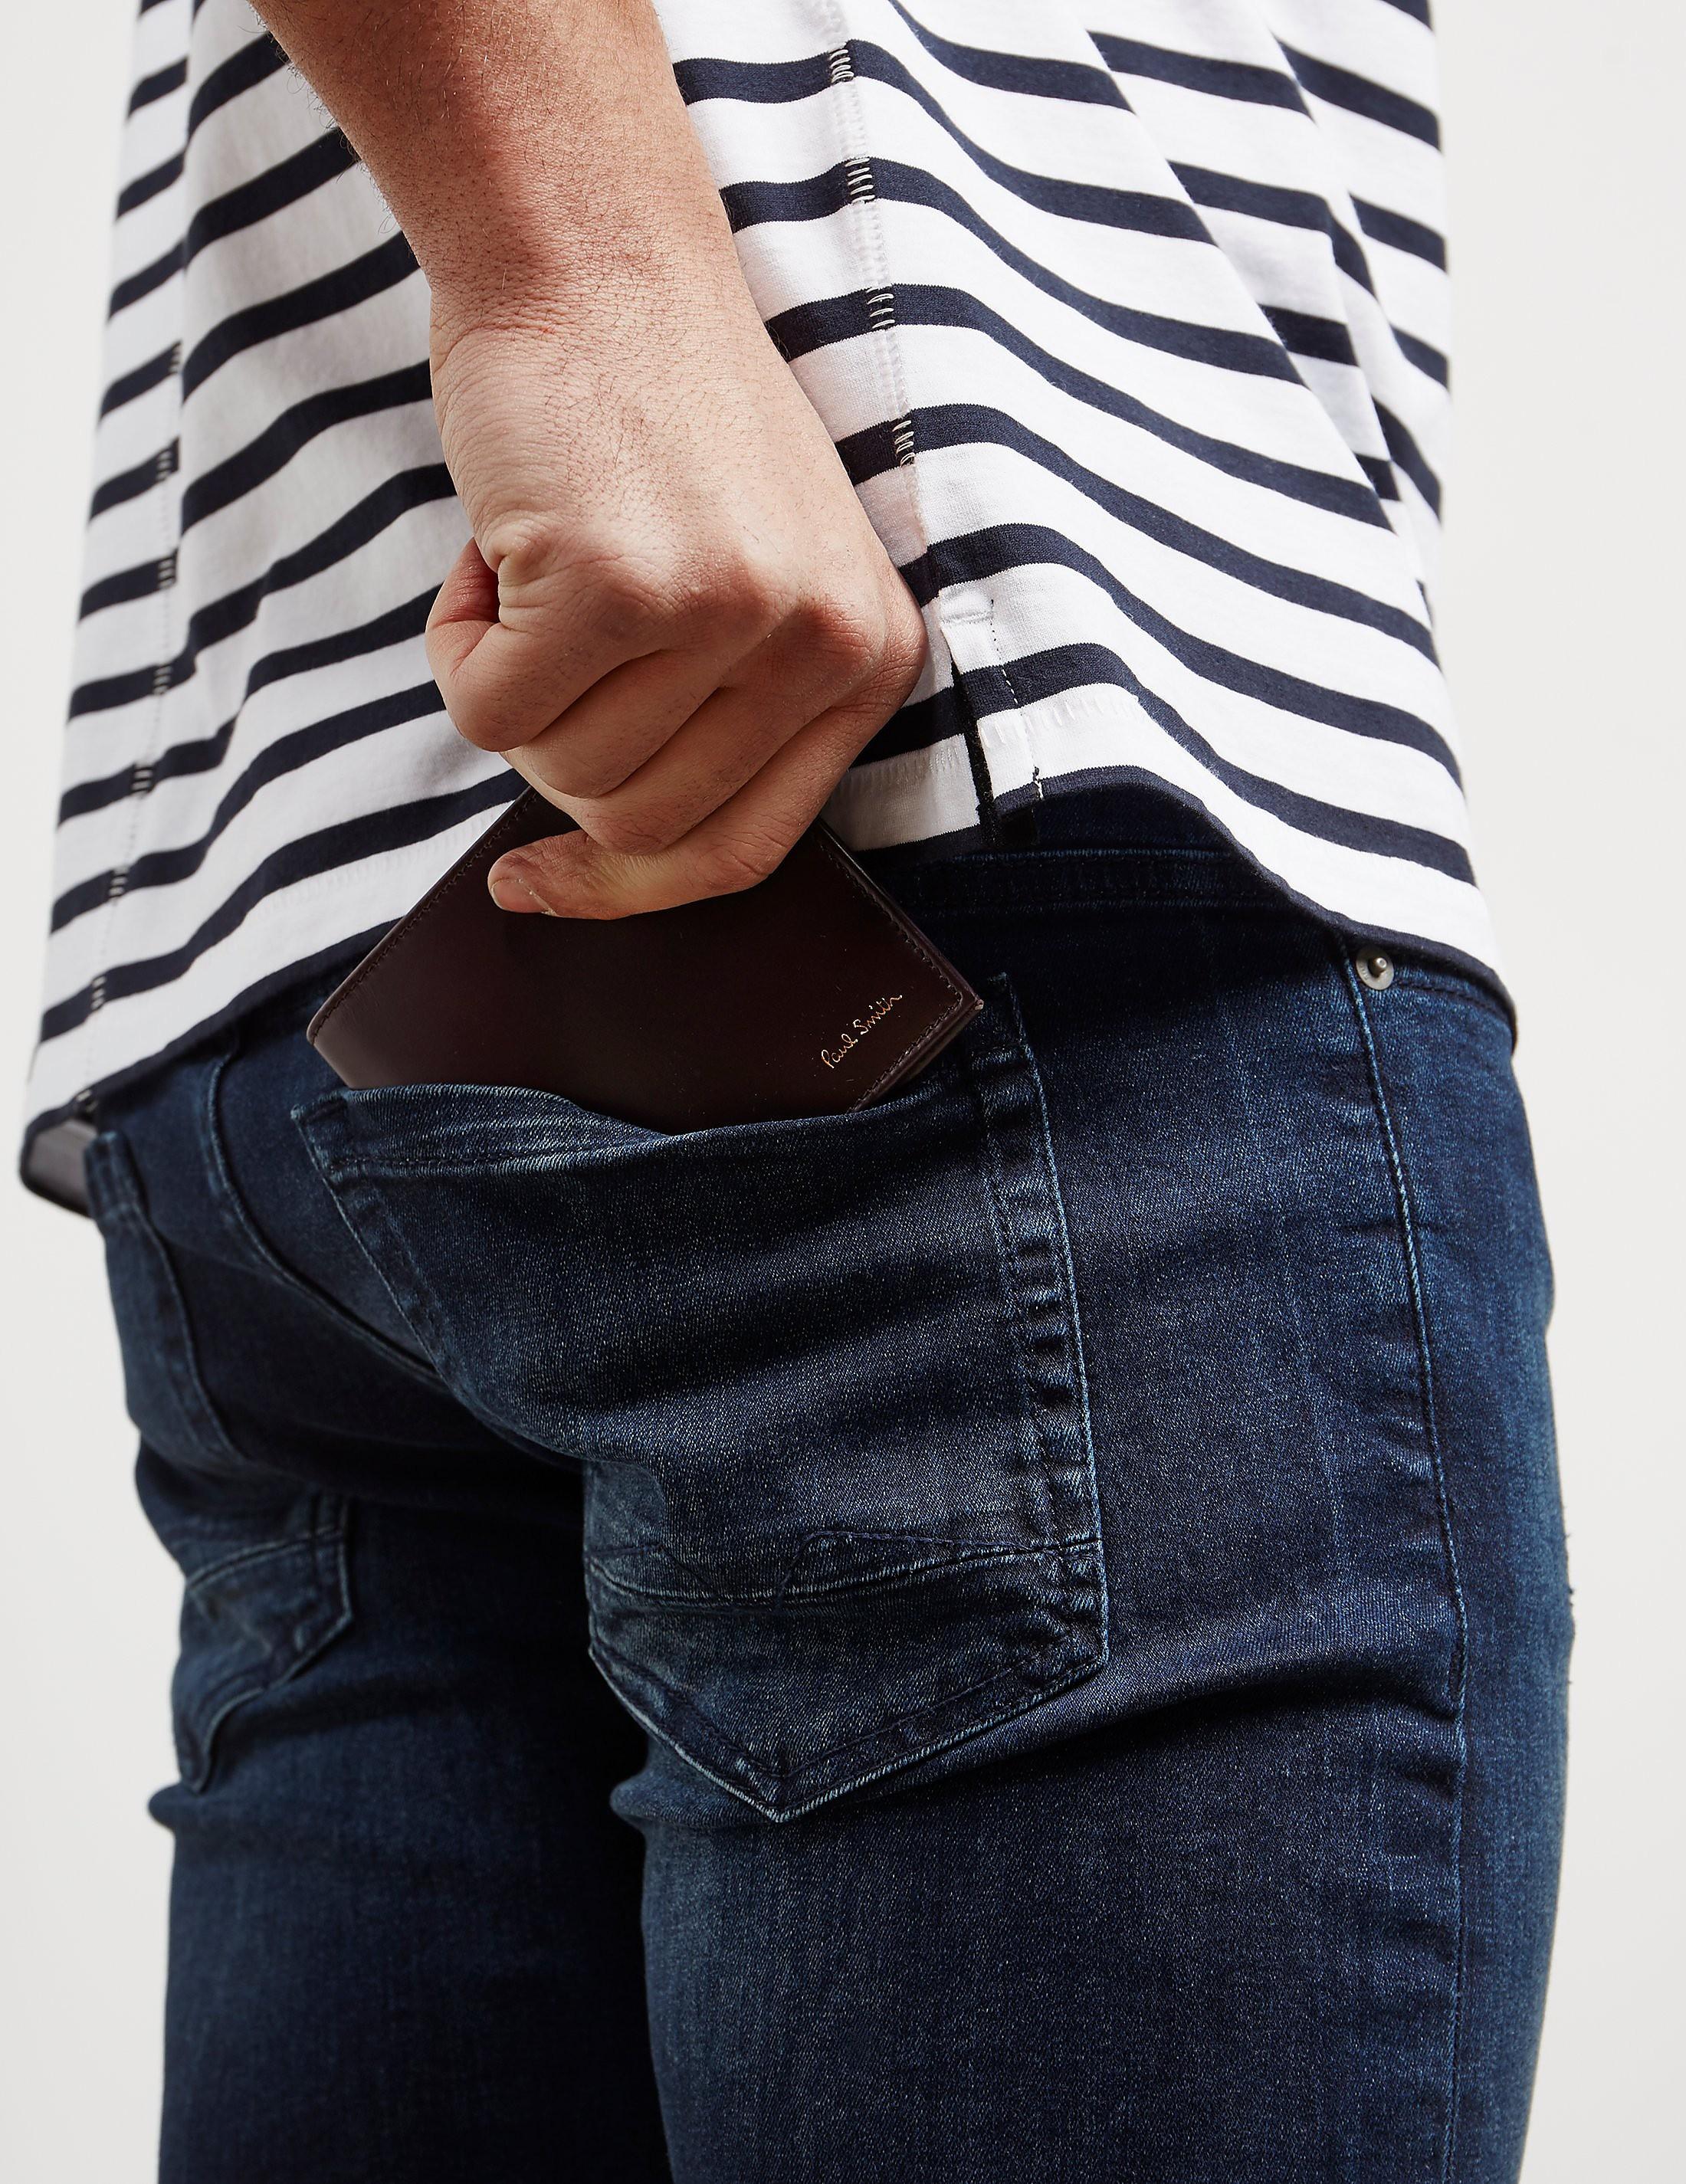 Paul Smith Close Stripe Wallet